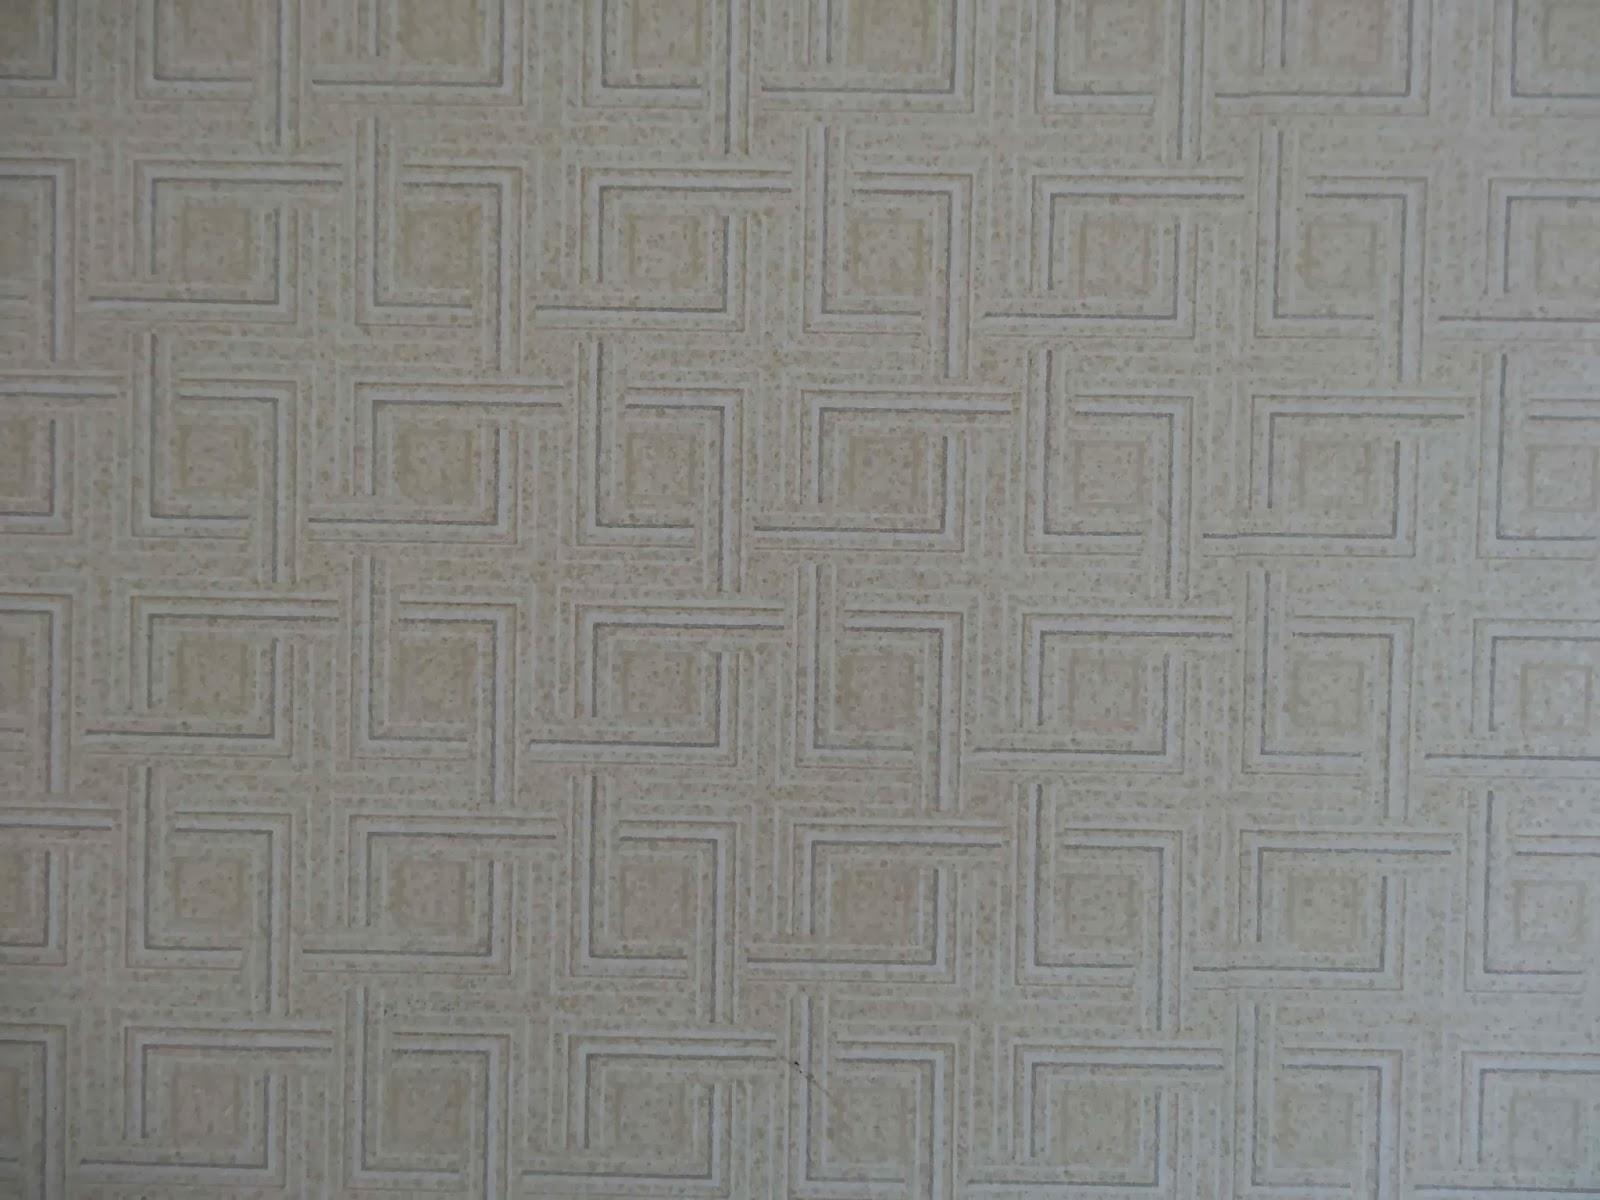 martins werkstatt 22 oktober 2013 tapeten abkratzen. Black Bedroom Furniture Sets. Home Design Ideas